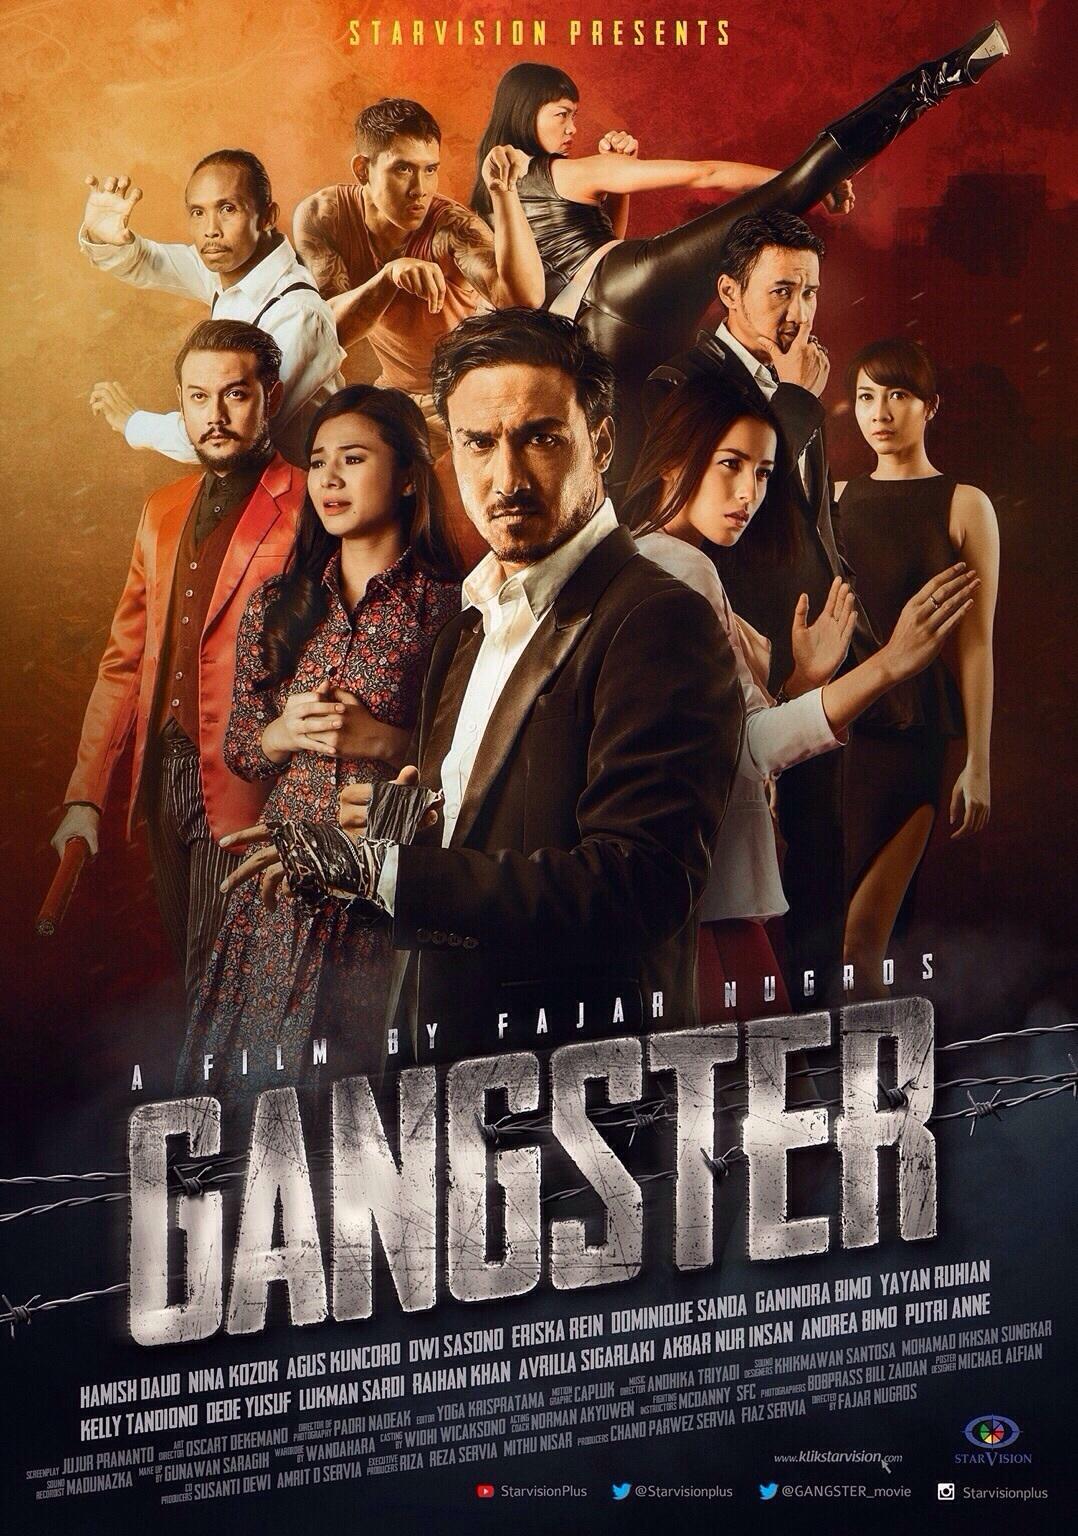 Nonton Film Teman Tapi Menikah 2 Full Movie : nonton, teman, menikah, movie, Indonesia, Movie, Generatorruby's